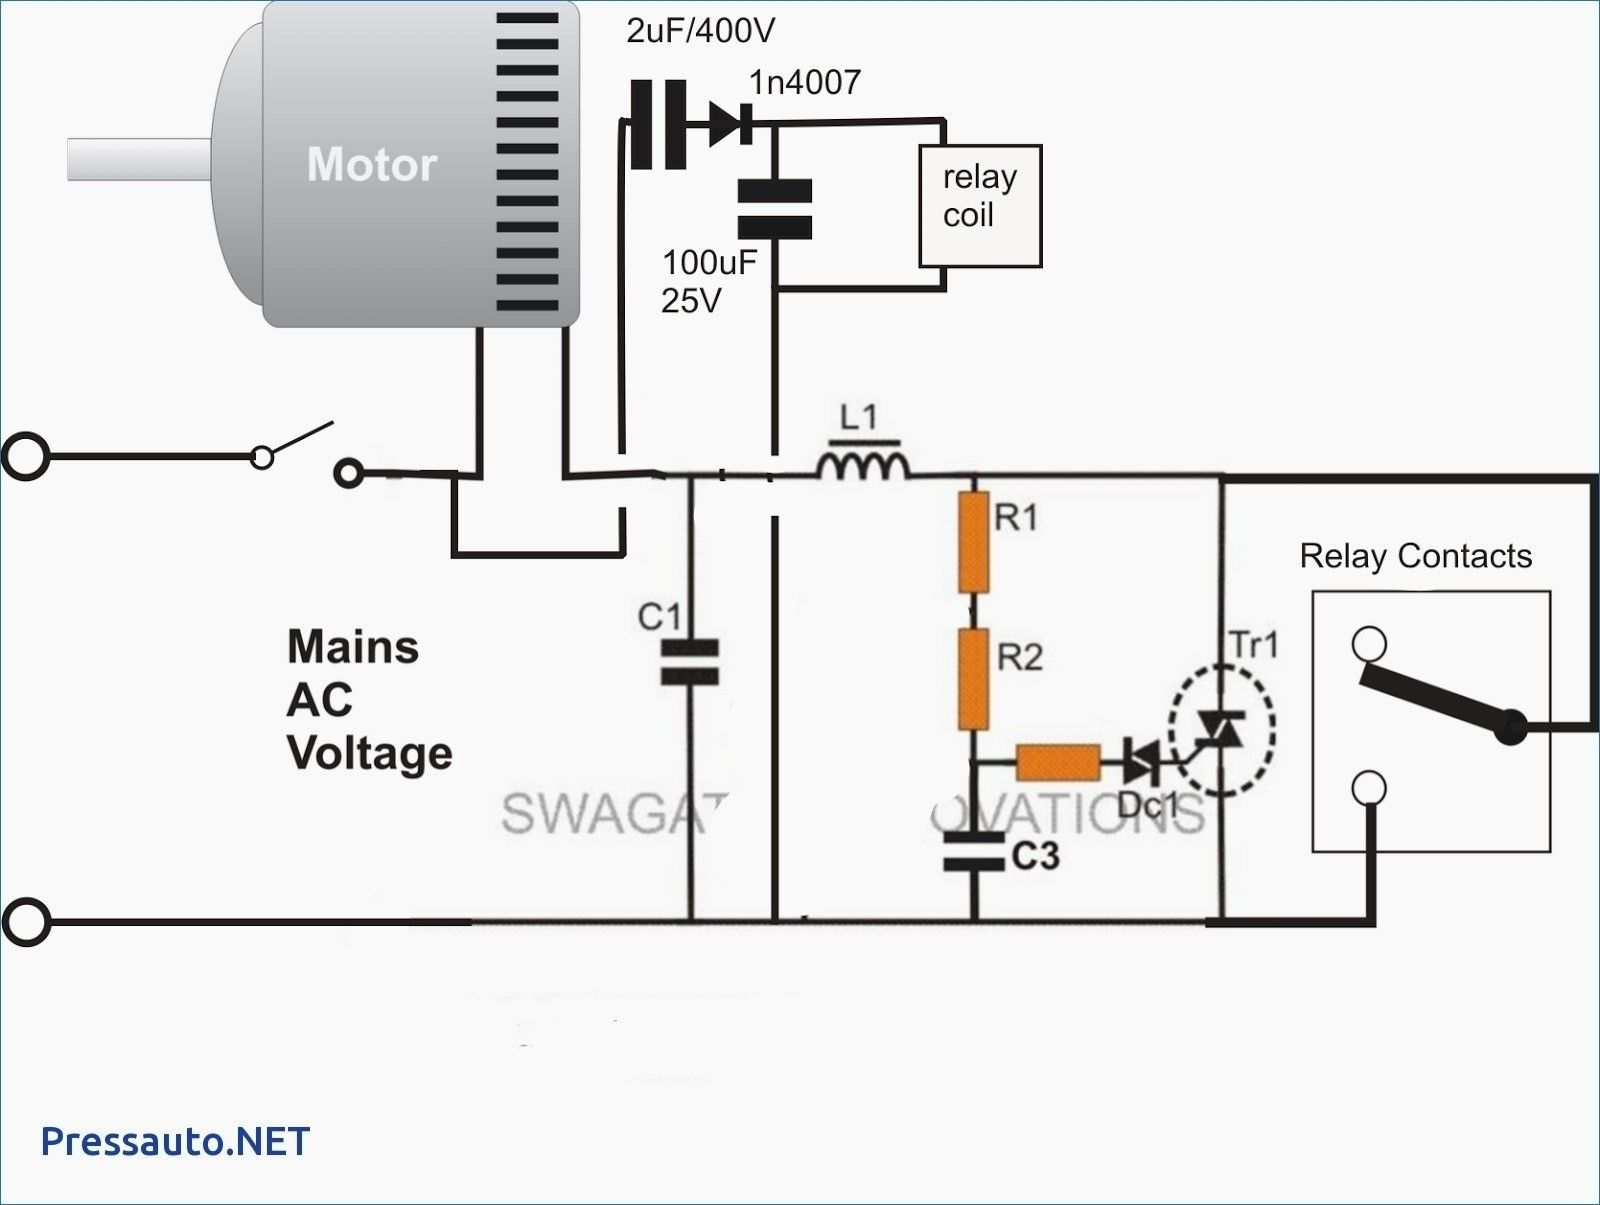 Unique Nema Contactor Wiring Diagram Diagram Diagramtemplate Diagramsample Electronic Circuit Projects Water Pump Motor Circuit Projects